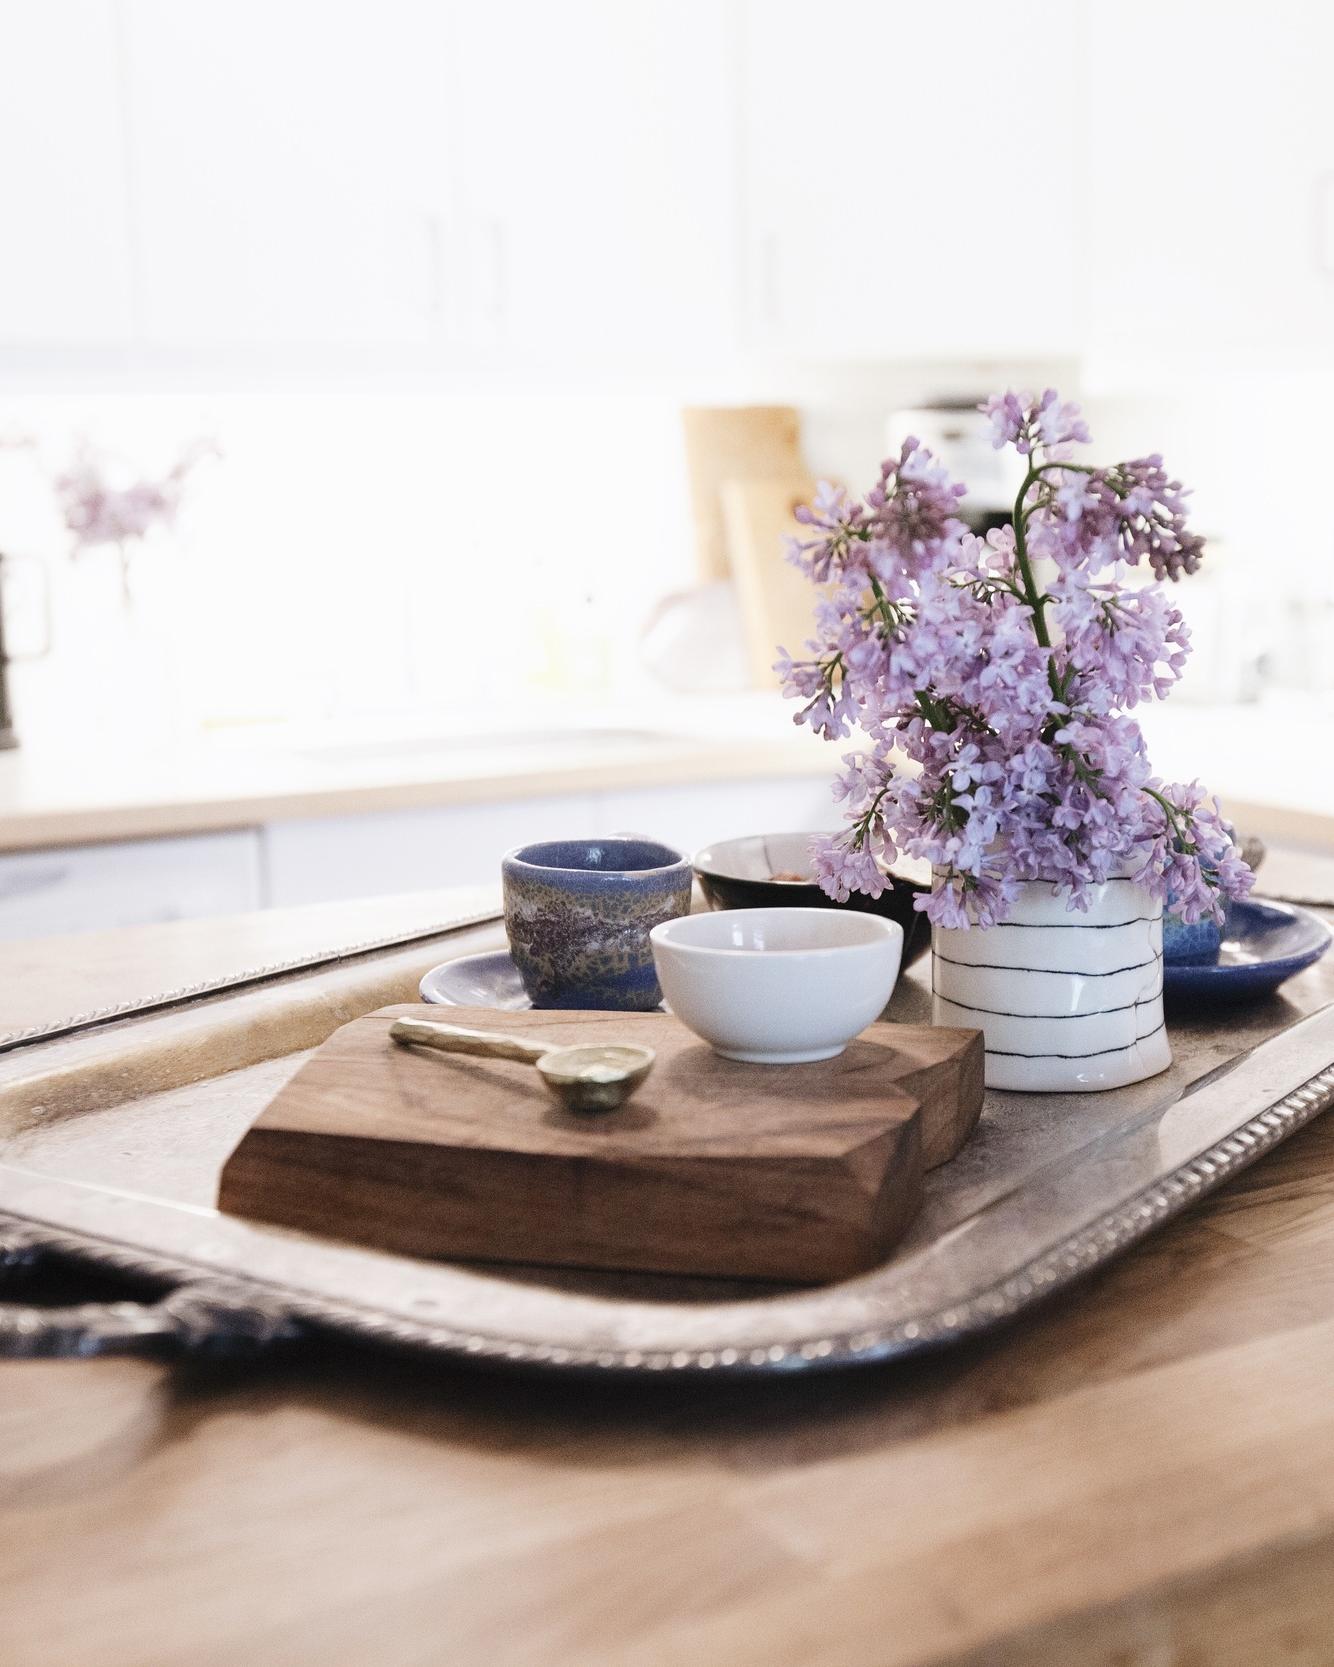 Brass Sugar Spoon  by Coil + Drift, Ceramics by  btw ceramics